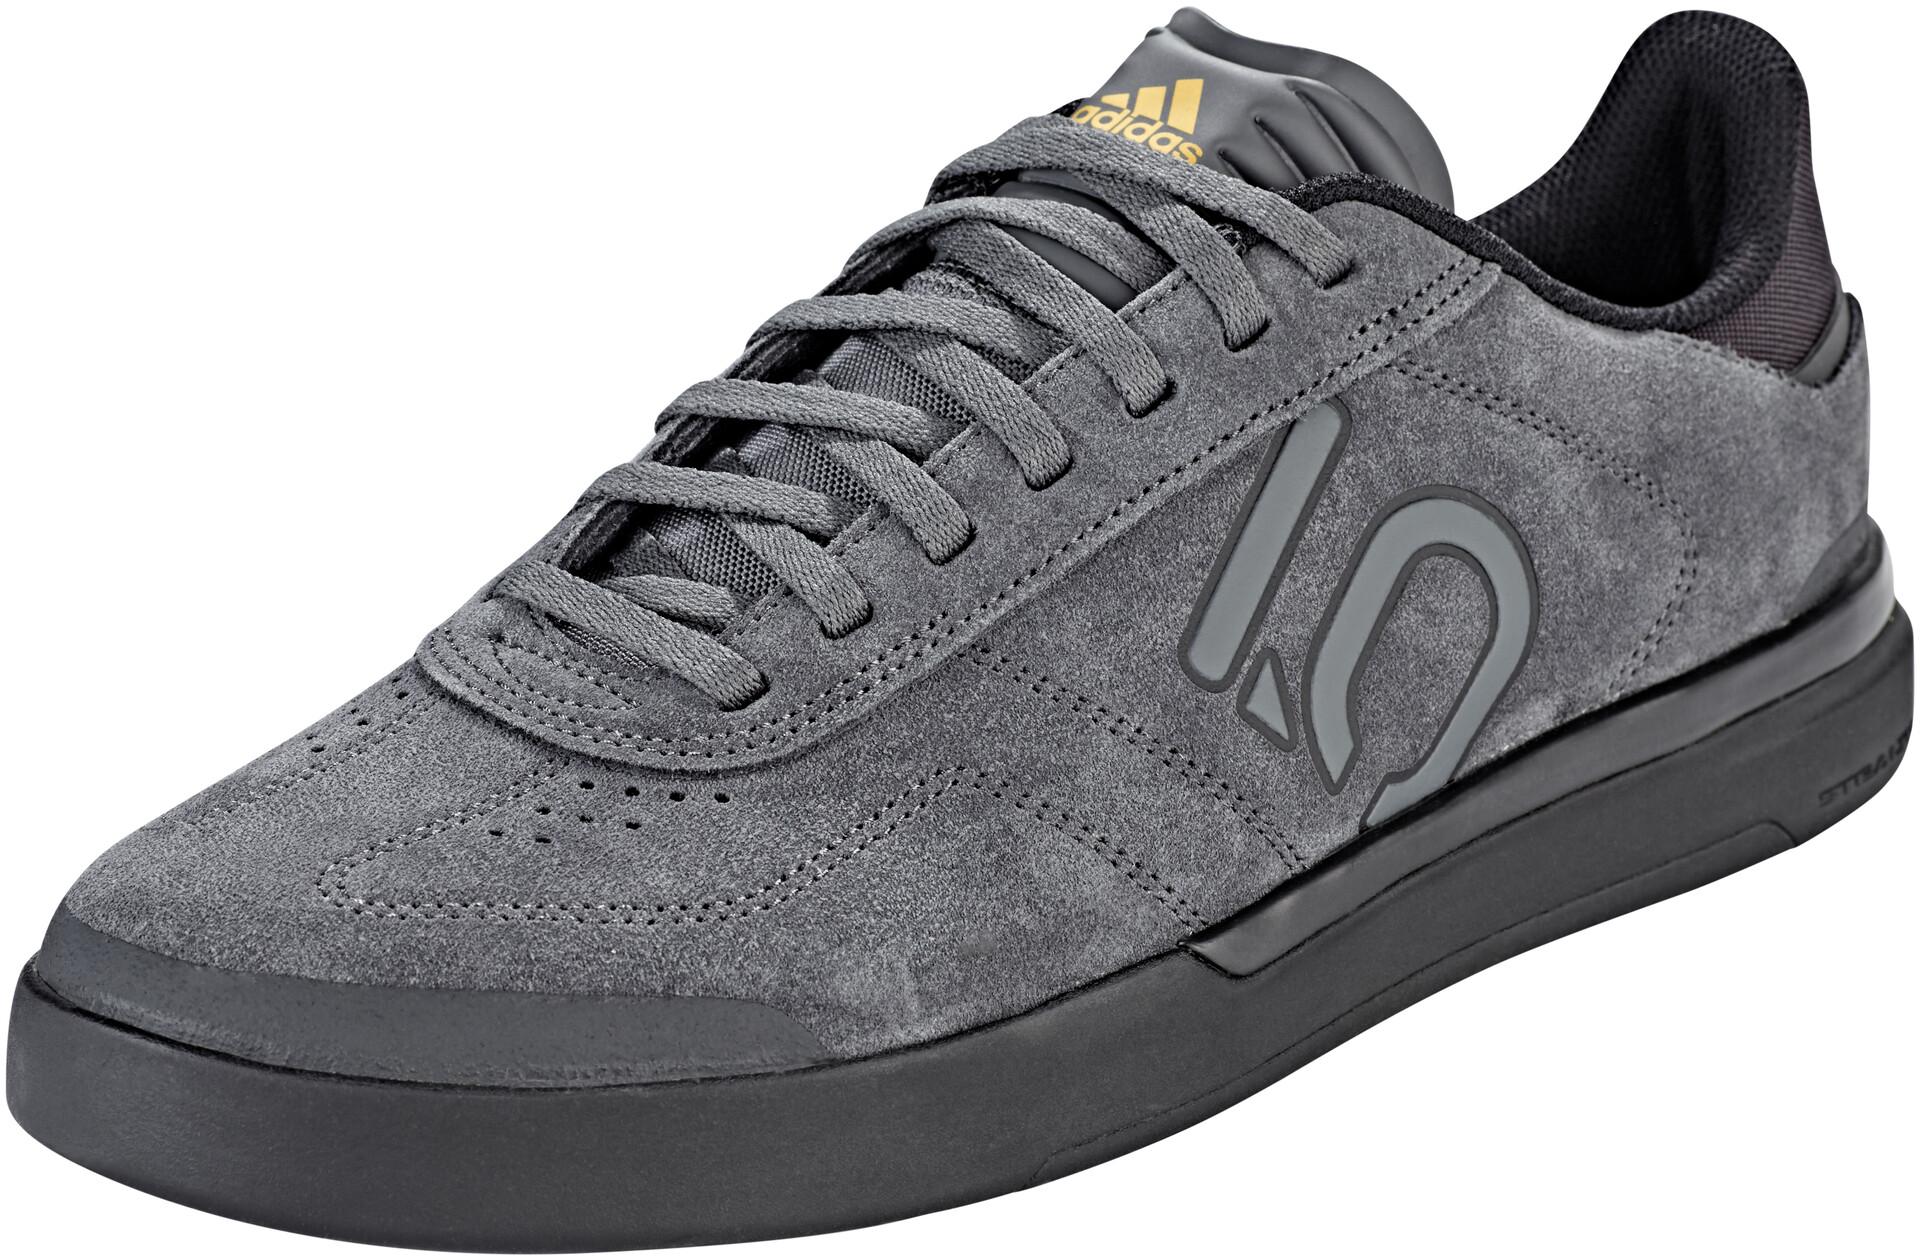 adidas Five Ten Sleuth DLX Mountain Bike Shoes Men gresixcore blackmagold